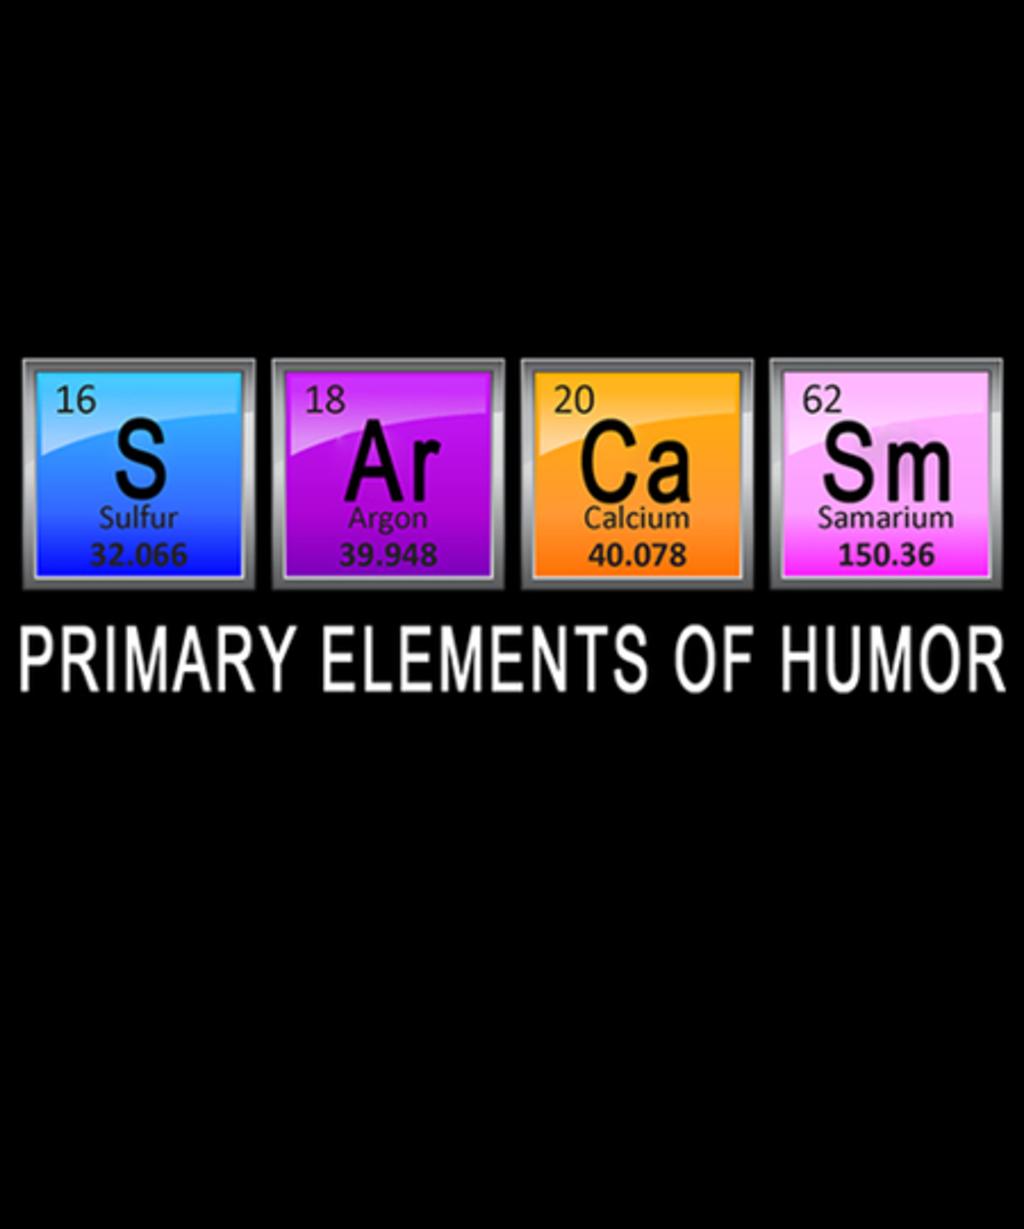 Qwertee: Primary elements of humor